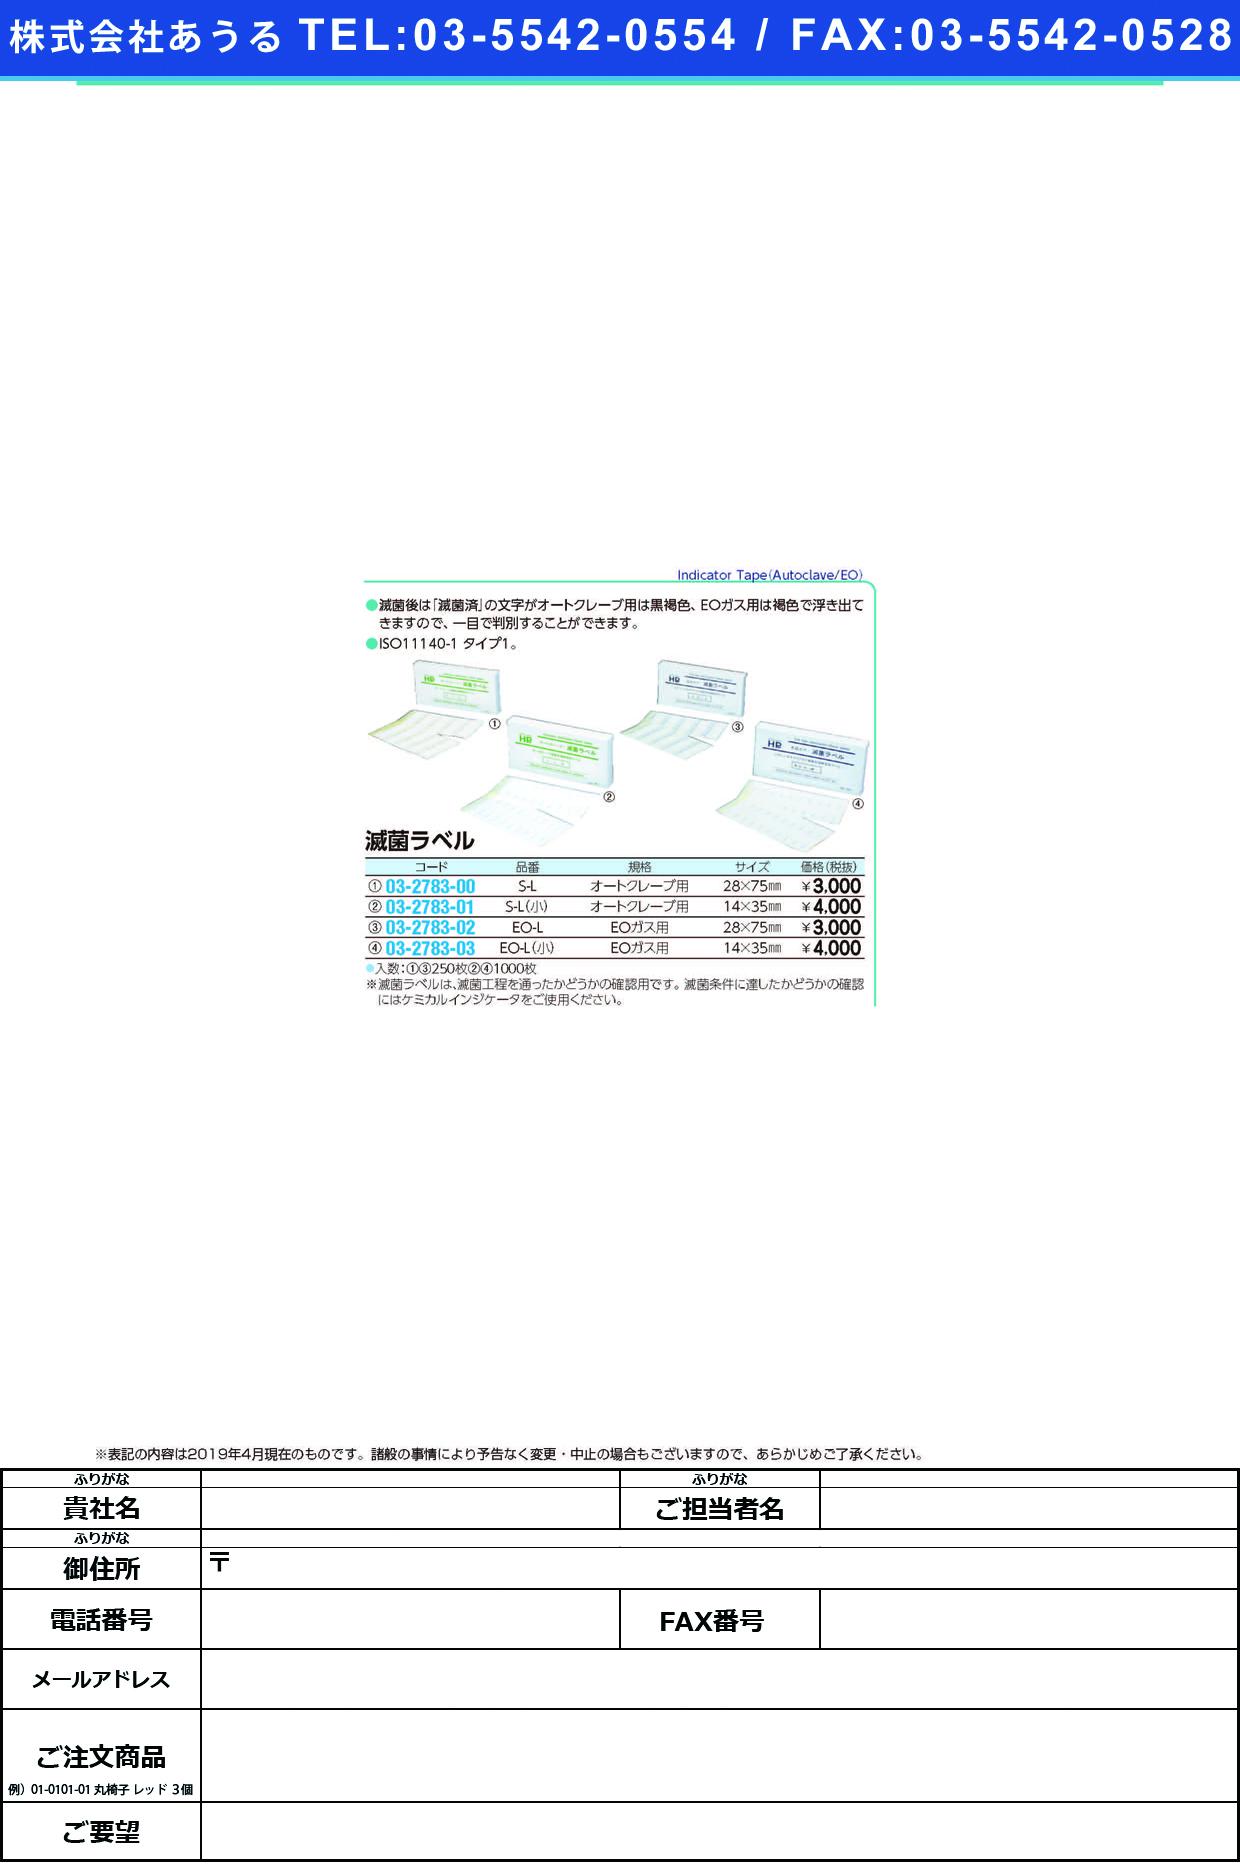 (03-2783-00)HP滅菌ラベル(オートクレーブ用) S-L(28X75MM)250マイイリ メッキンラベル(イワツキ)【1箱単位】【2019年カタログ商品】